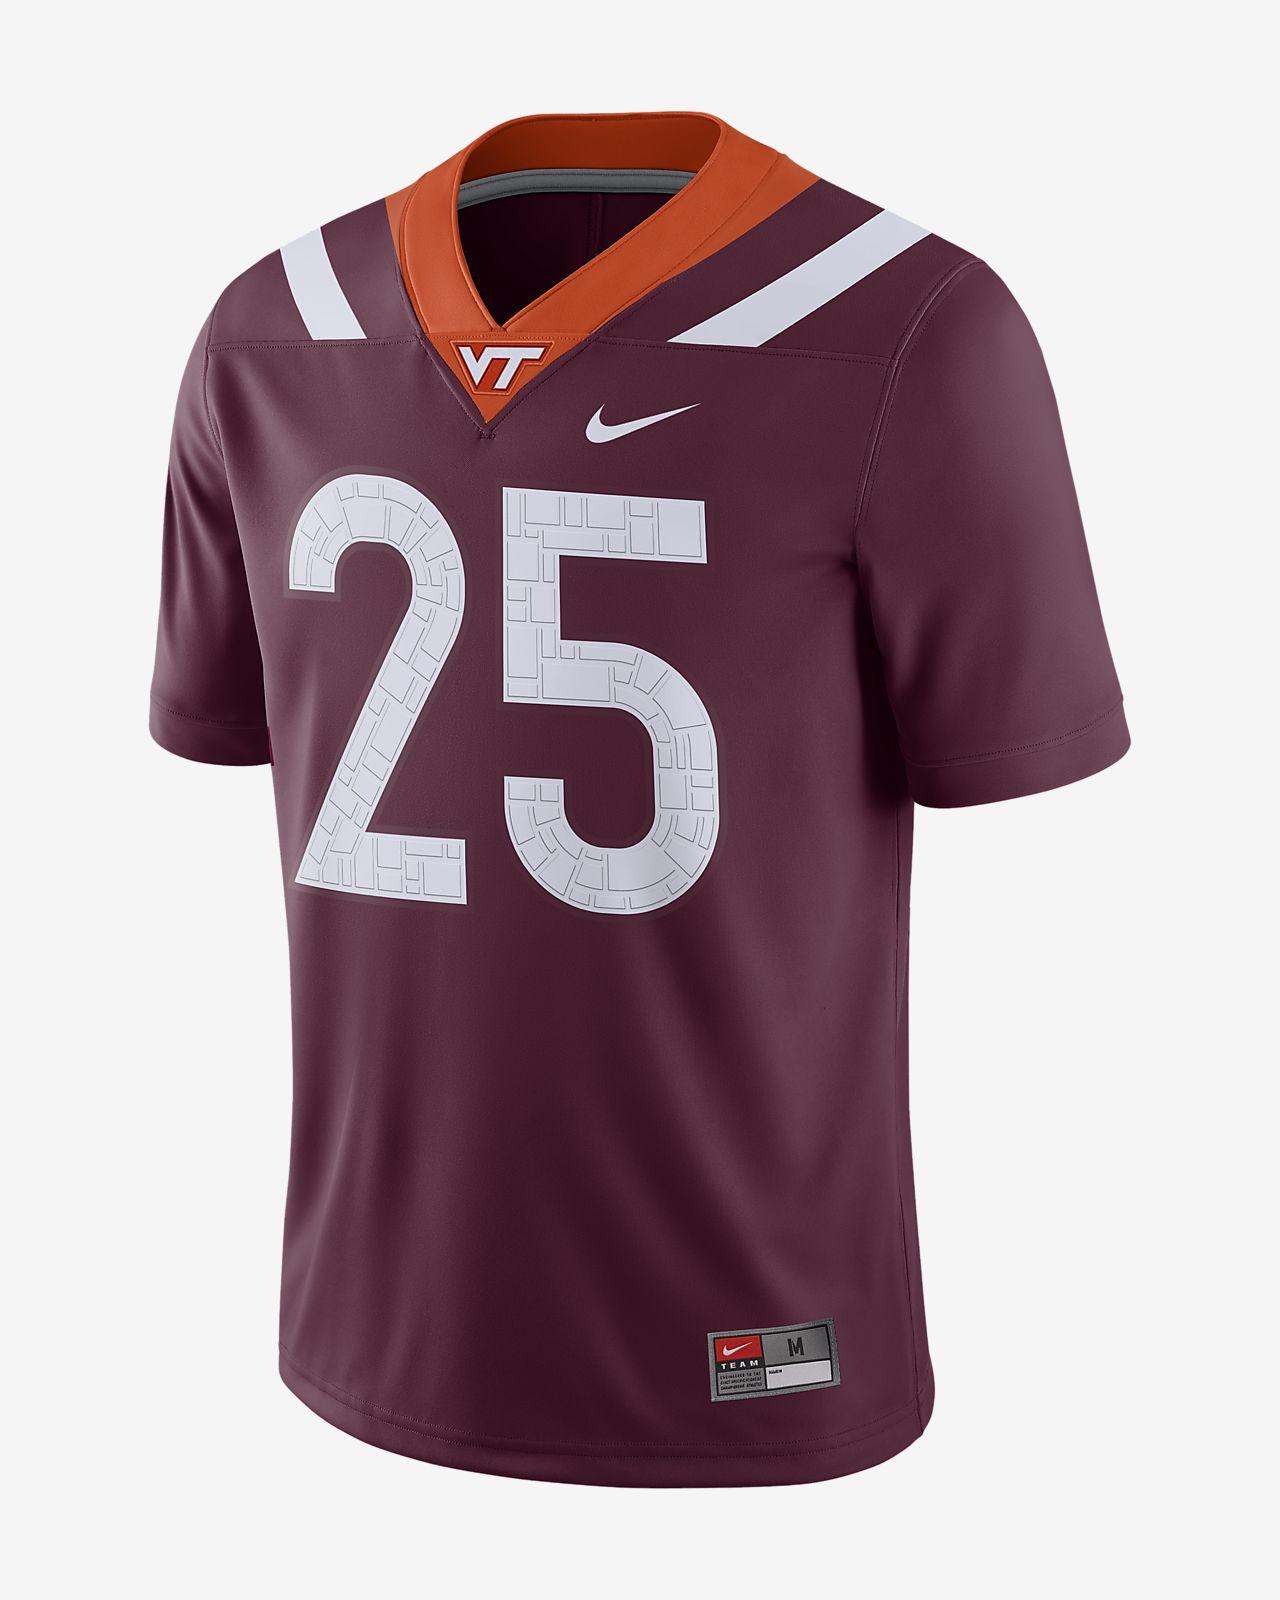 Nike College Dri-FIT Game (Virginia Tech) Men's Football Jersey